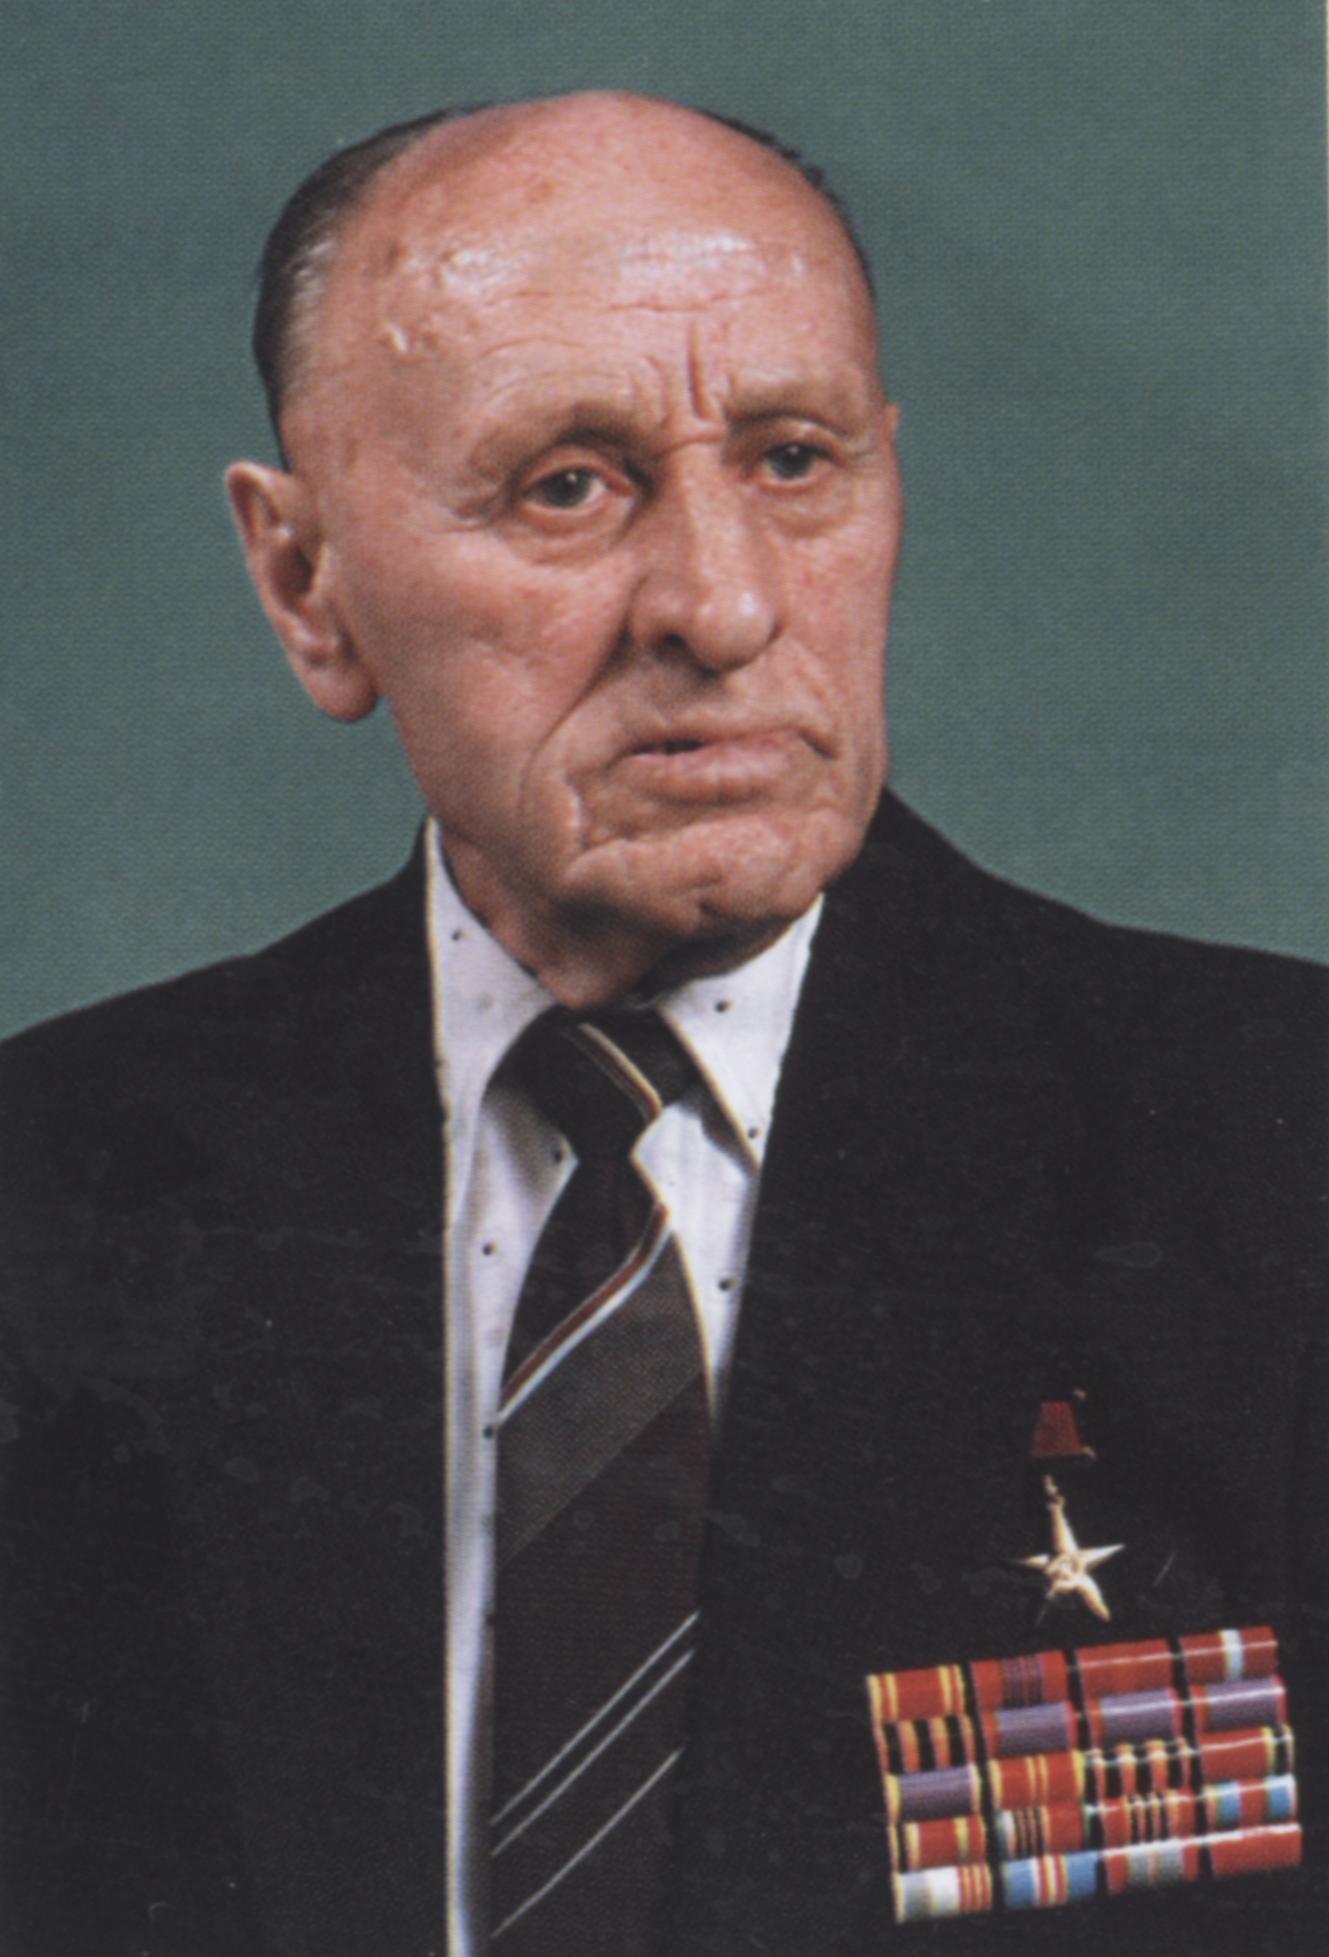 Коровин Михаил Петрович